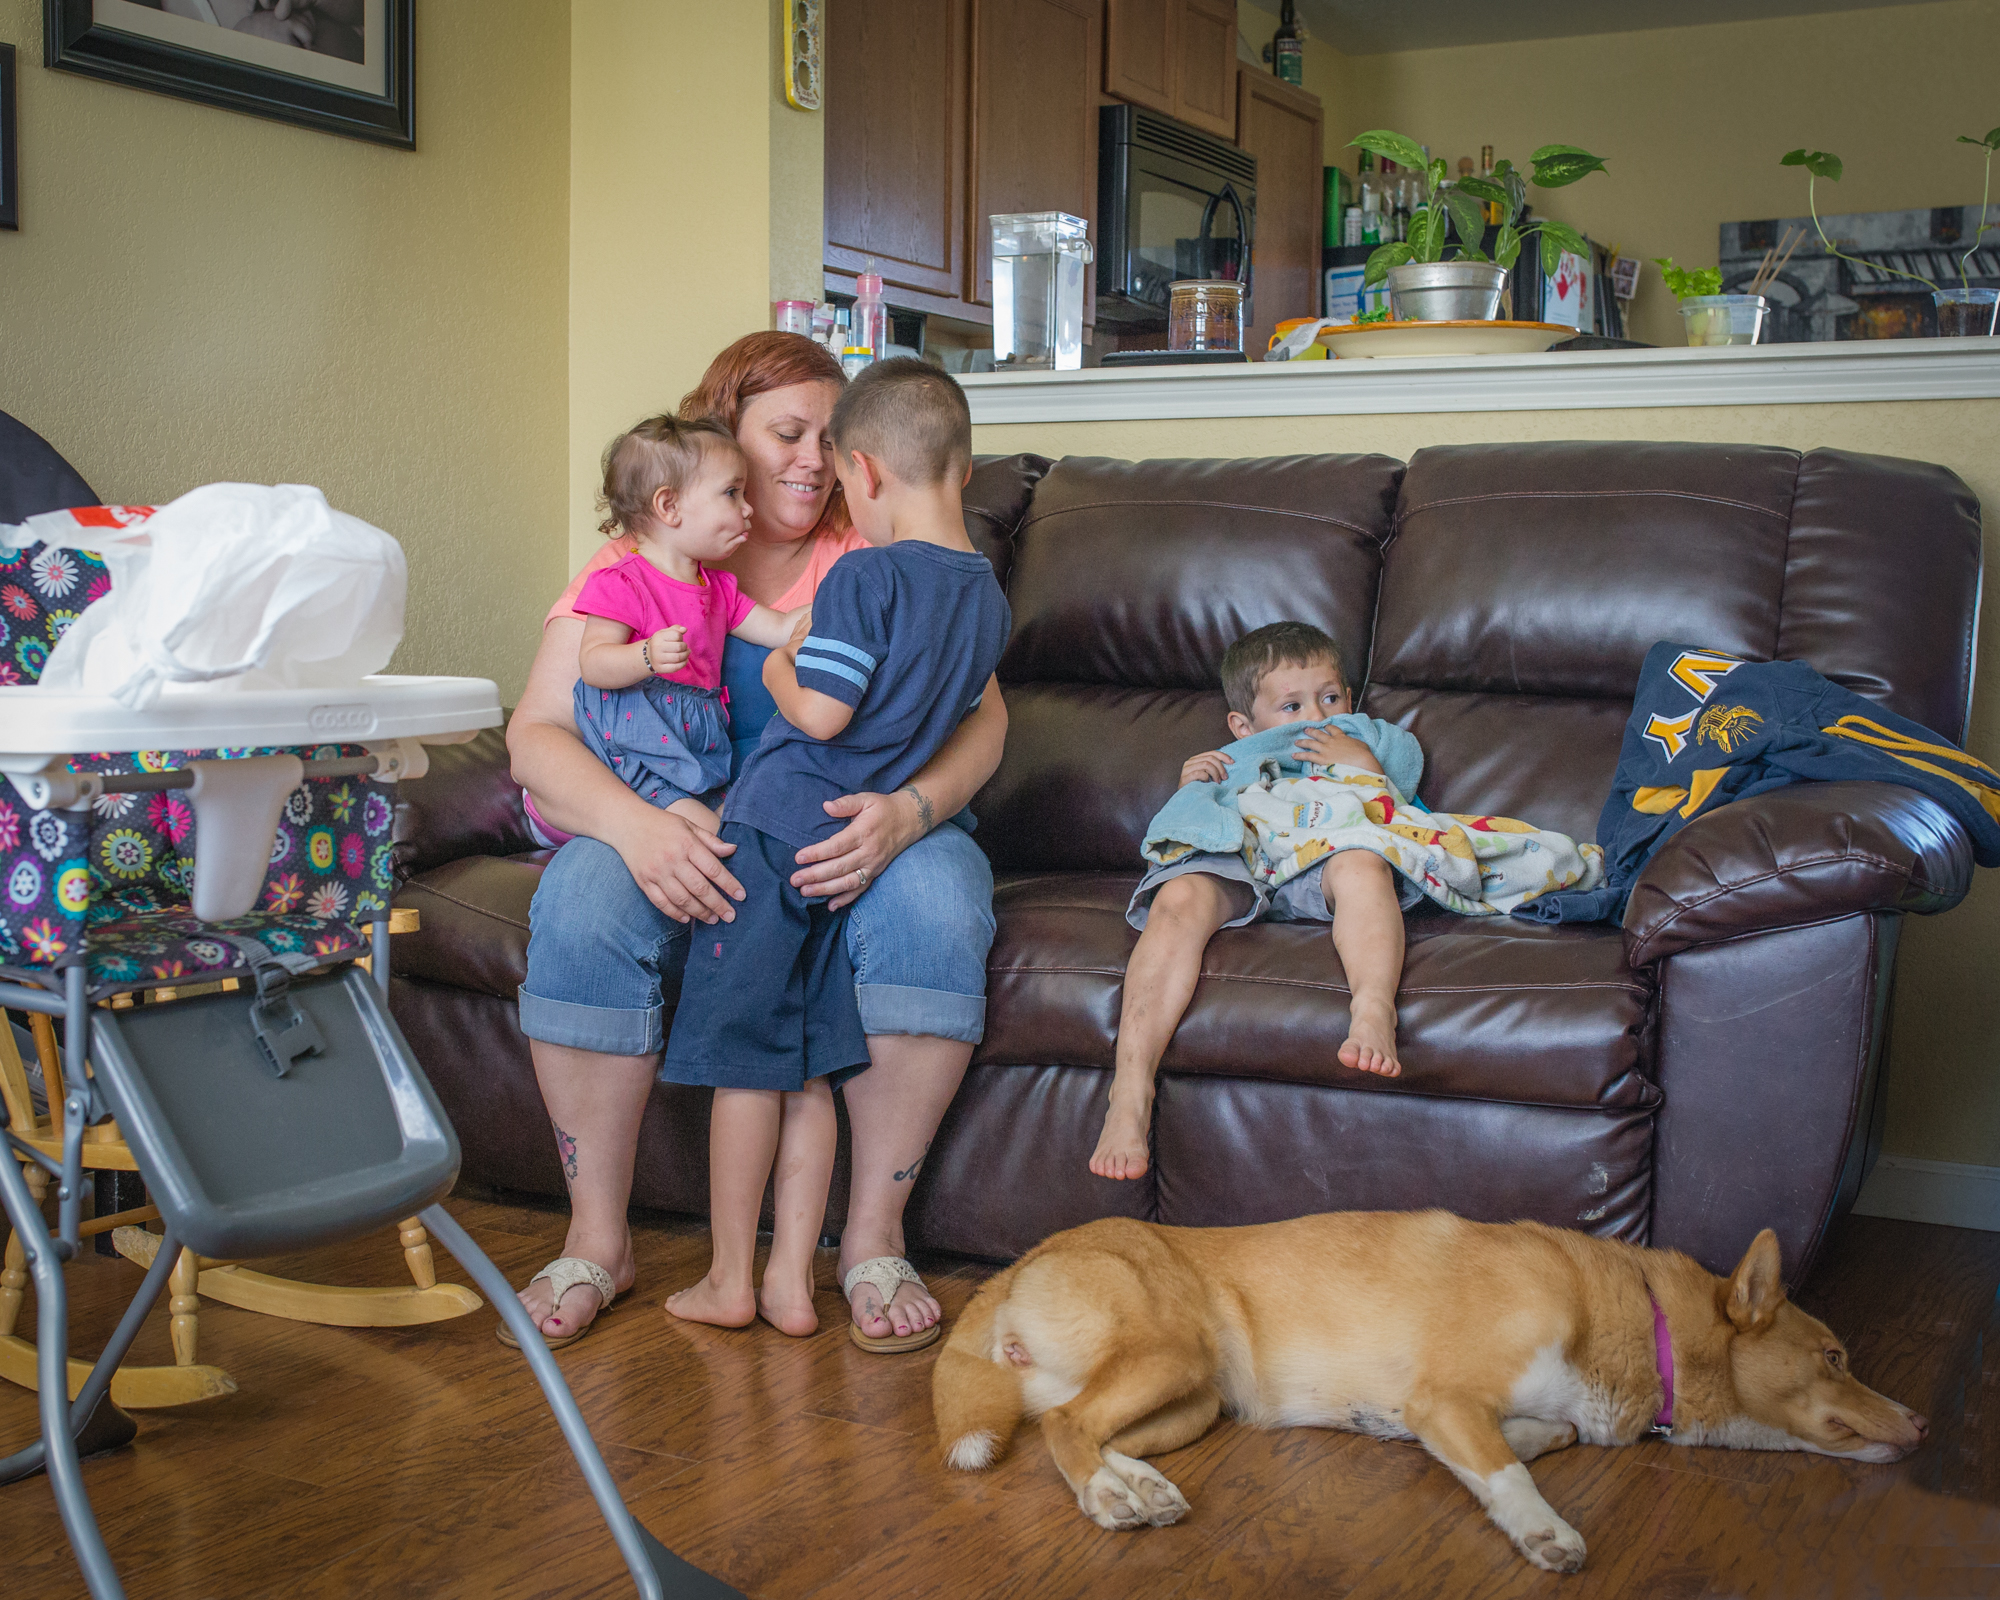 New Braunfels Documentary Portrait Photographer   Mom's everyday life.